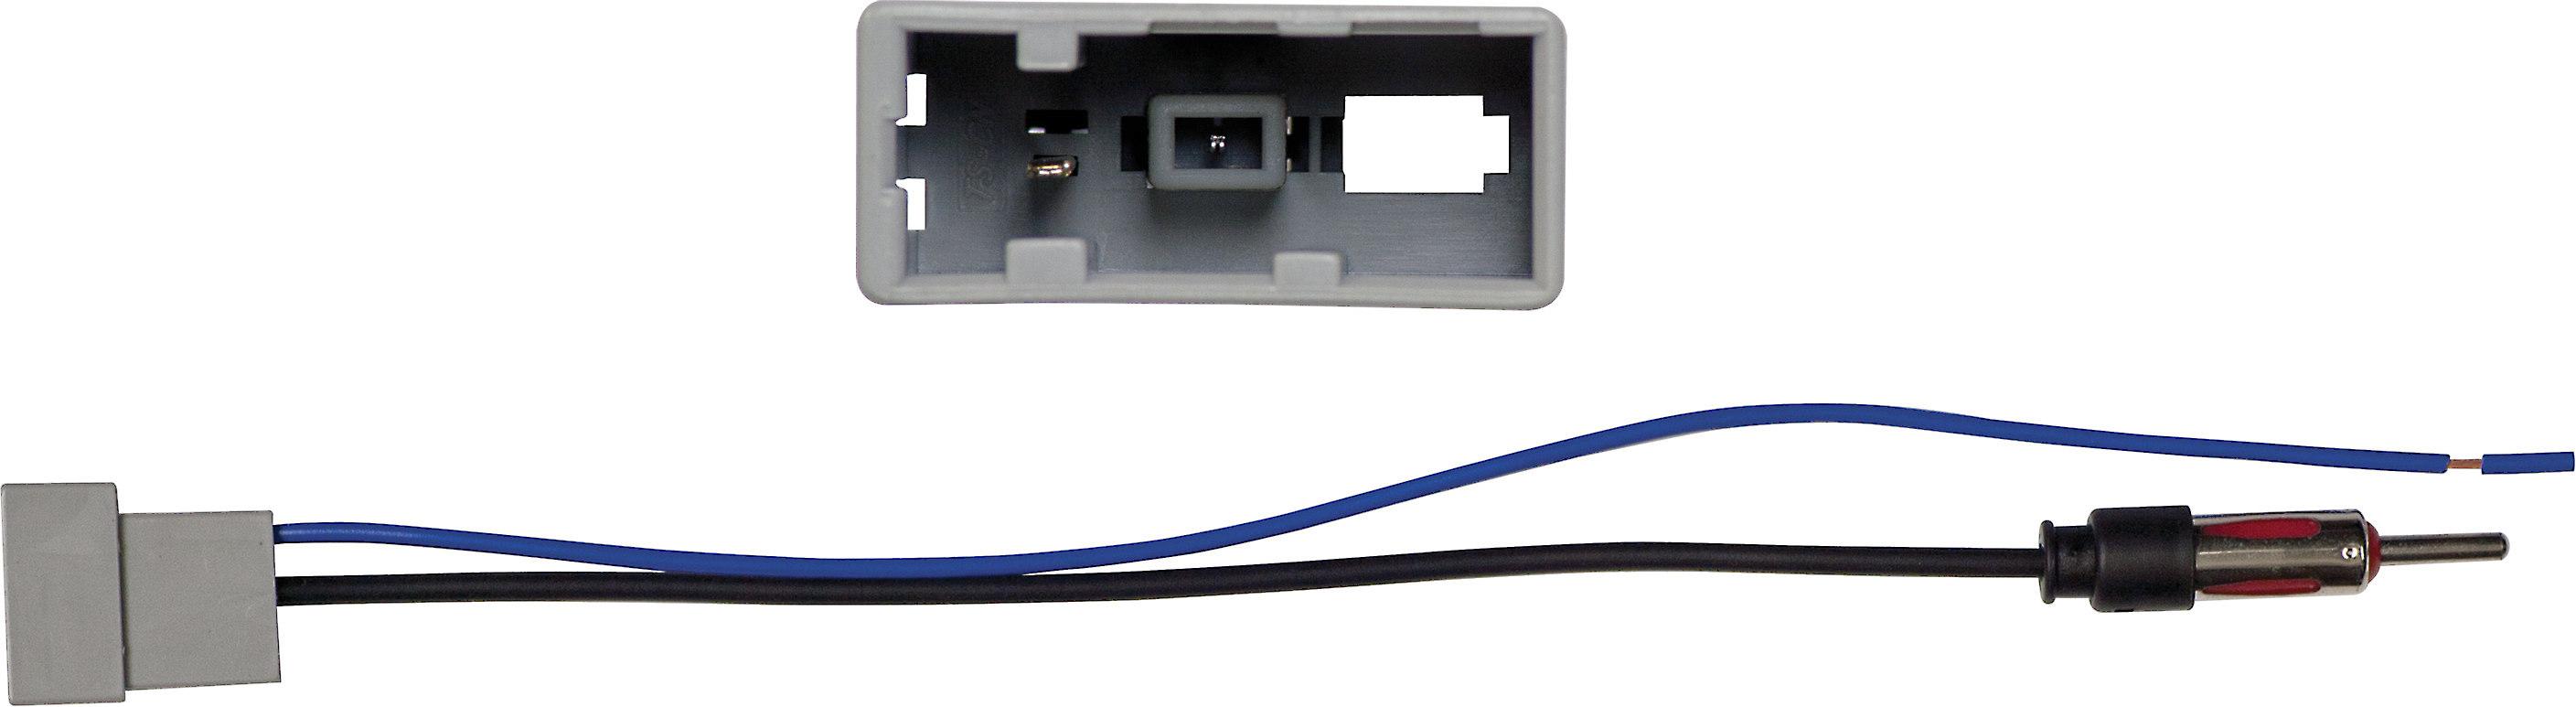 2000 nissan maxima antenna wiring metra 40 ni12 antenna adapter works with select 2007 up infiniti  metra 40 ni12 antenna adapter works